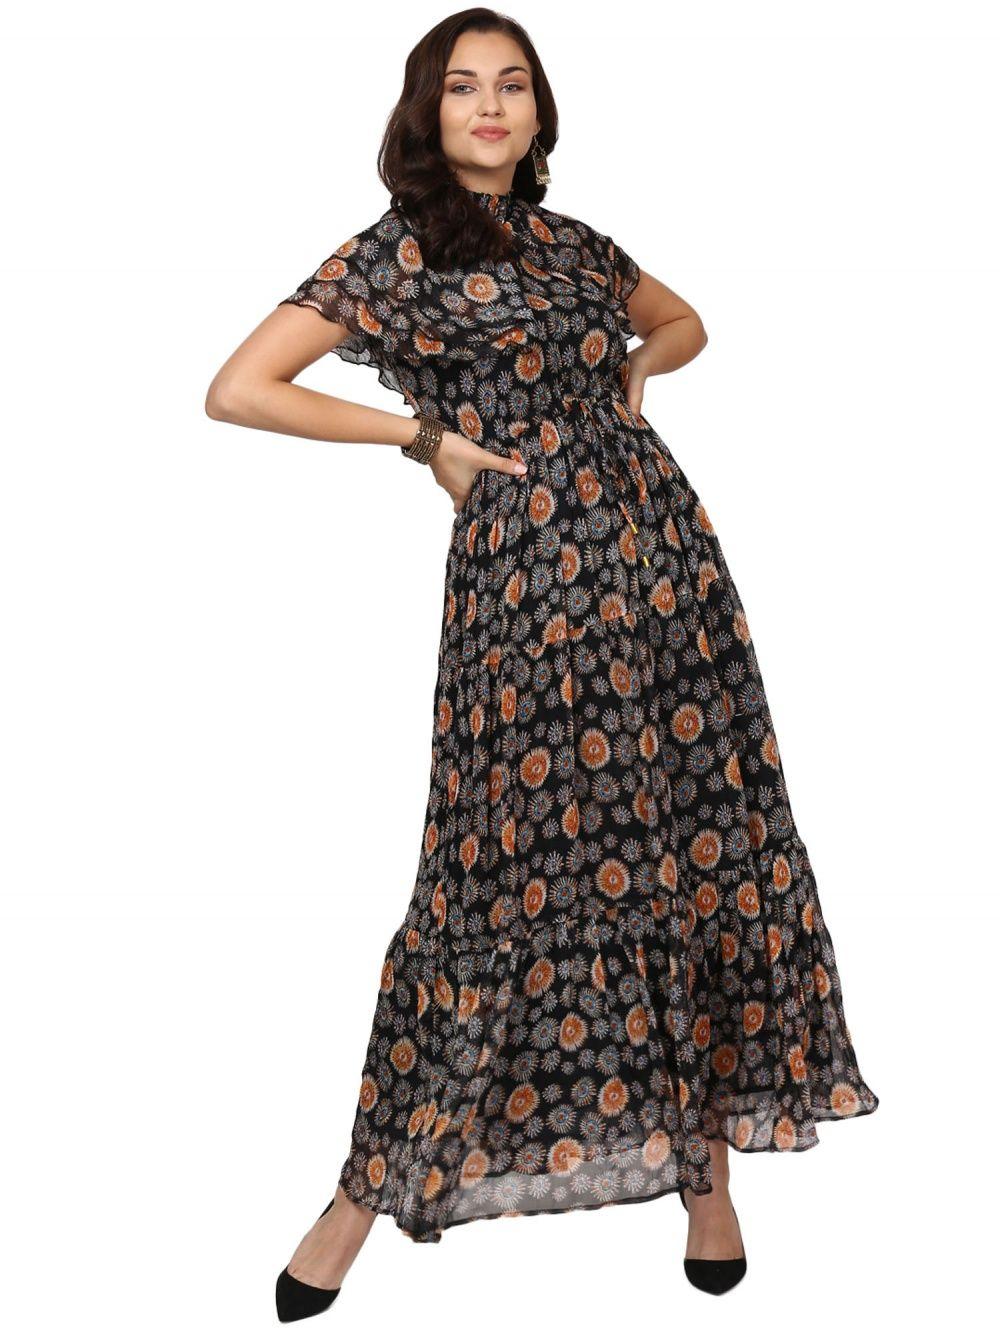 ce2cdb338e6 Label Ritu Kumar Dresses   Buy Label Ritu Kumar Black Printed ...